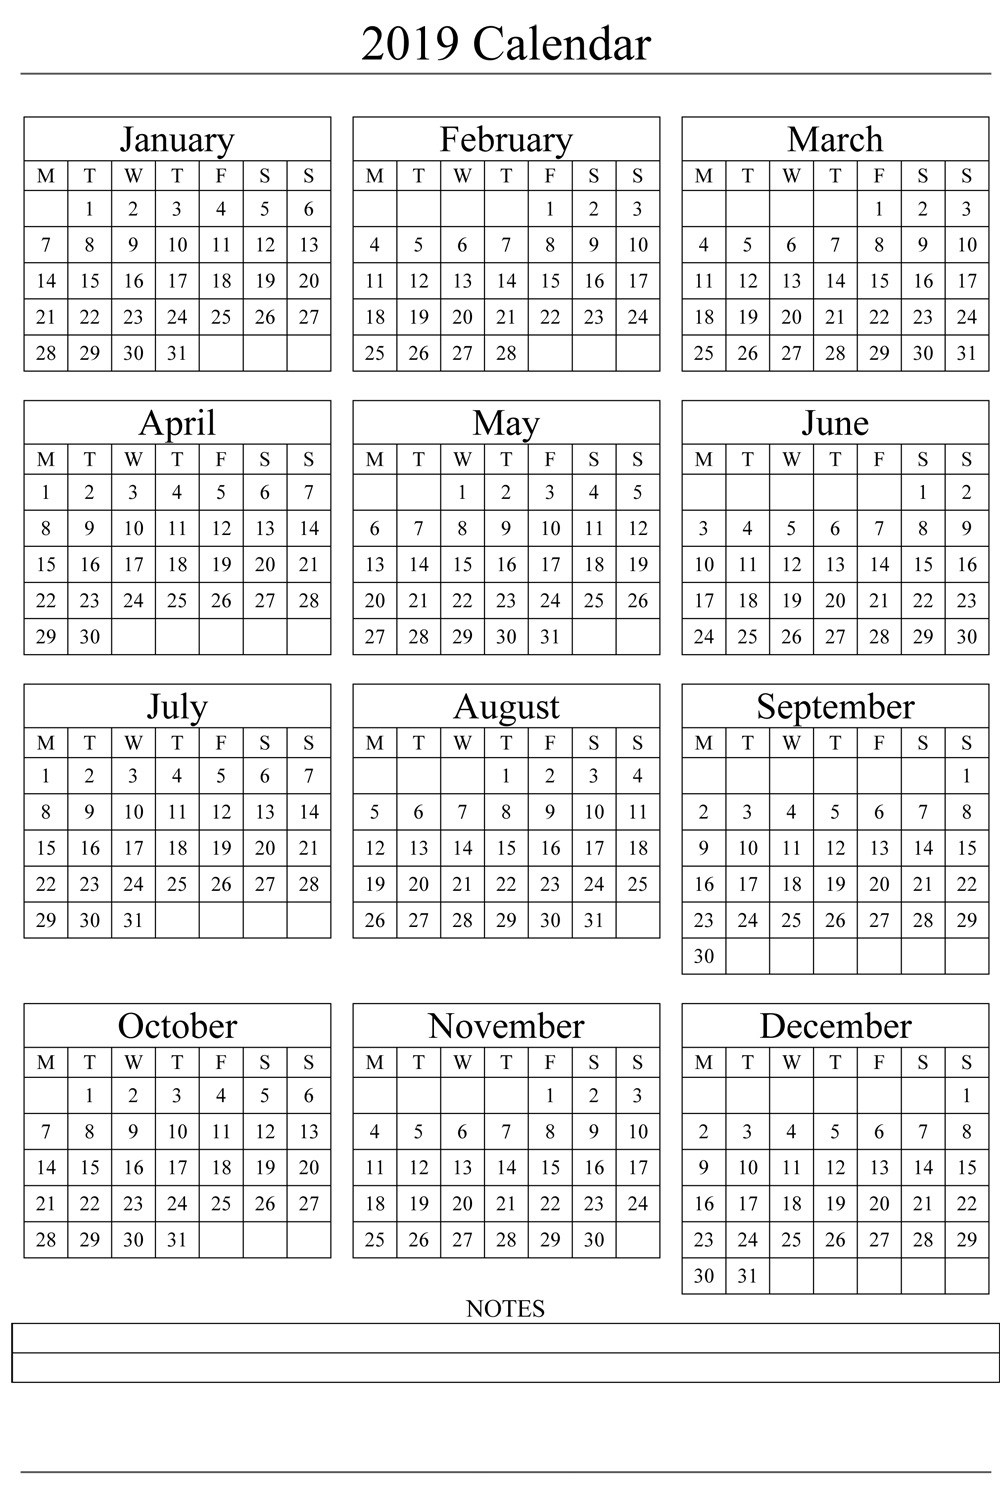 2019 Printable Calendar Templates - Blank Word Pdf